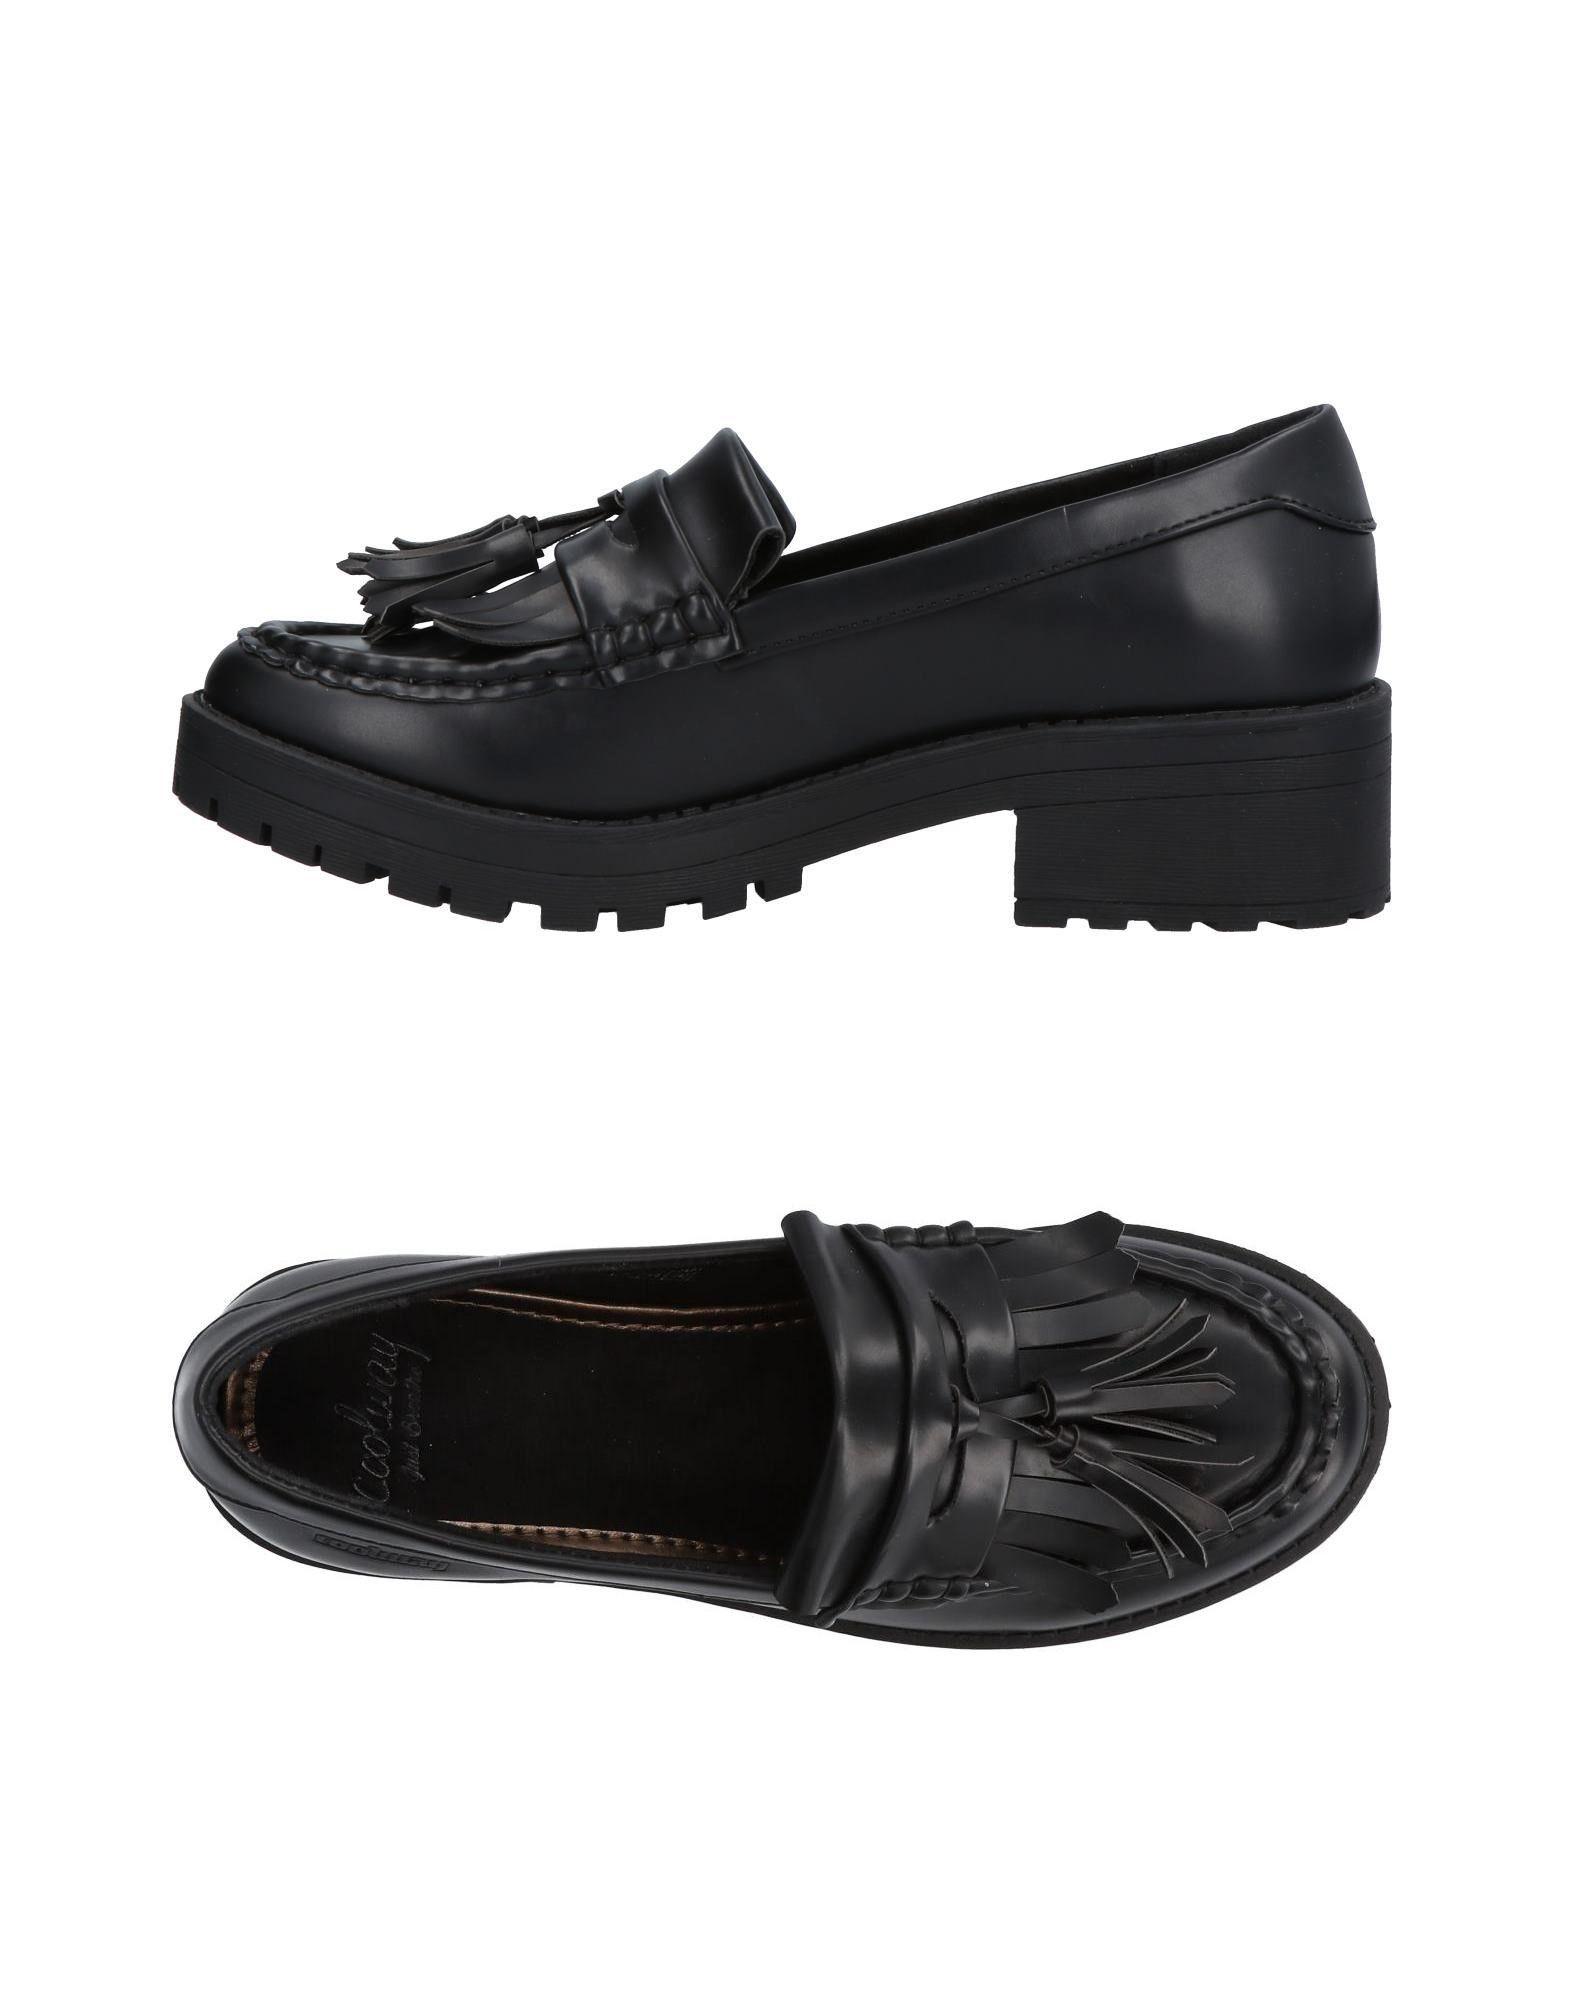 Coolway Mokassins Damen  11464553TW Gute Qualität beliebte Schuhe